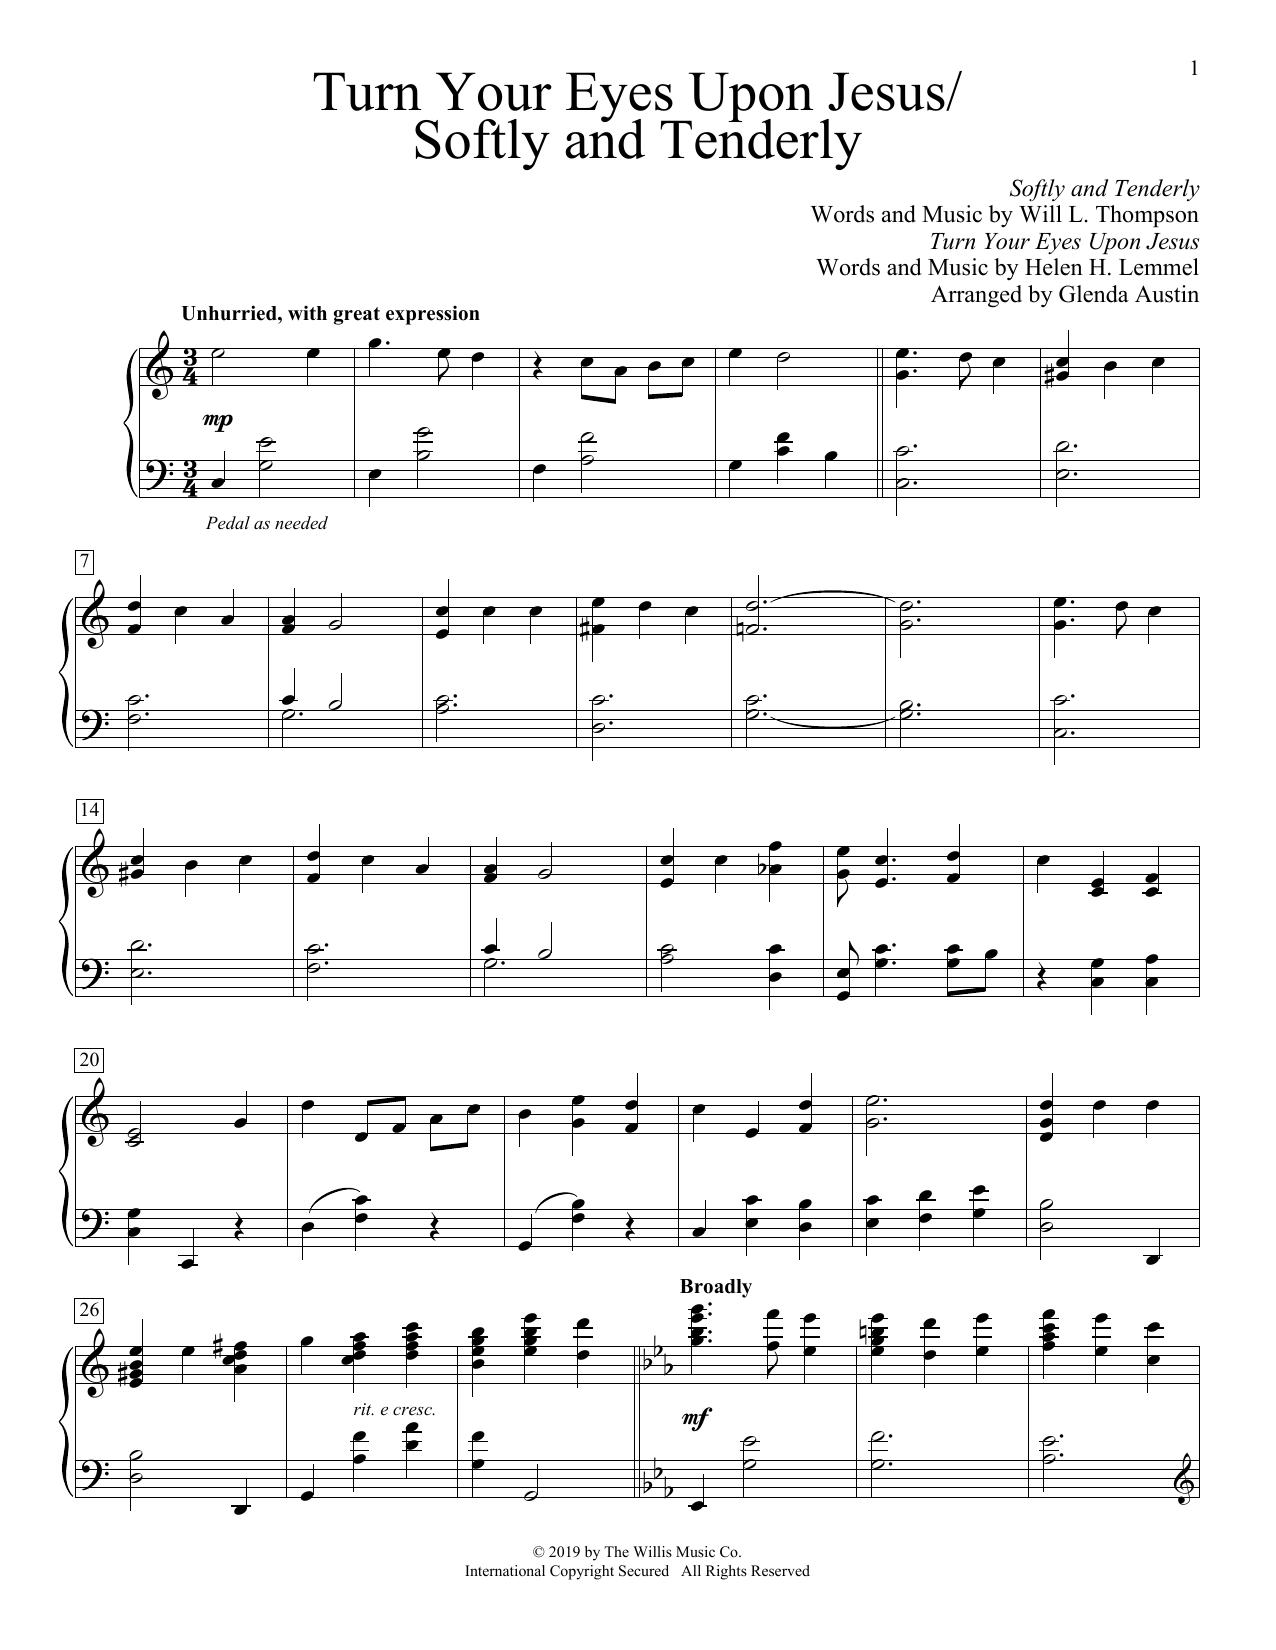 Turn Your Eyes Upon Jesus/Softly And Tenderly (arr. Glenda Austin) (Educational Piano)